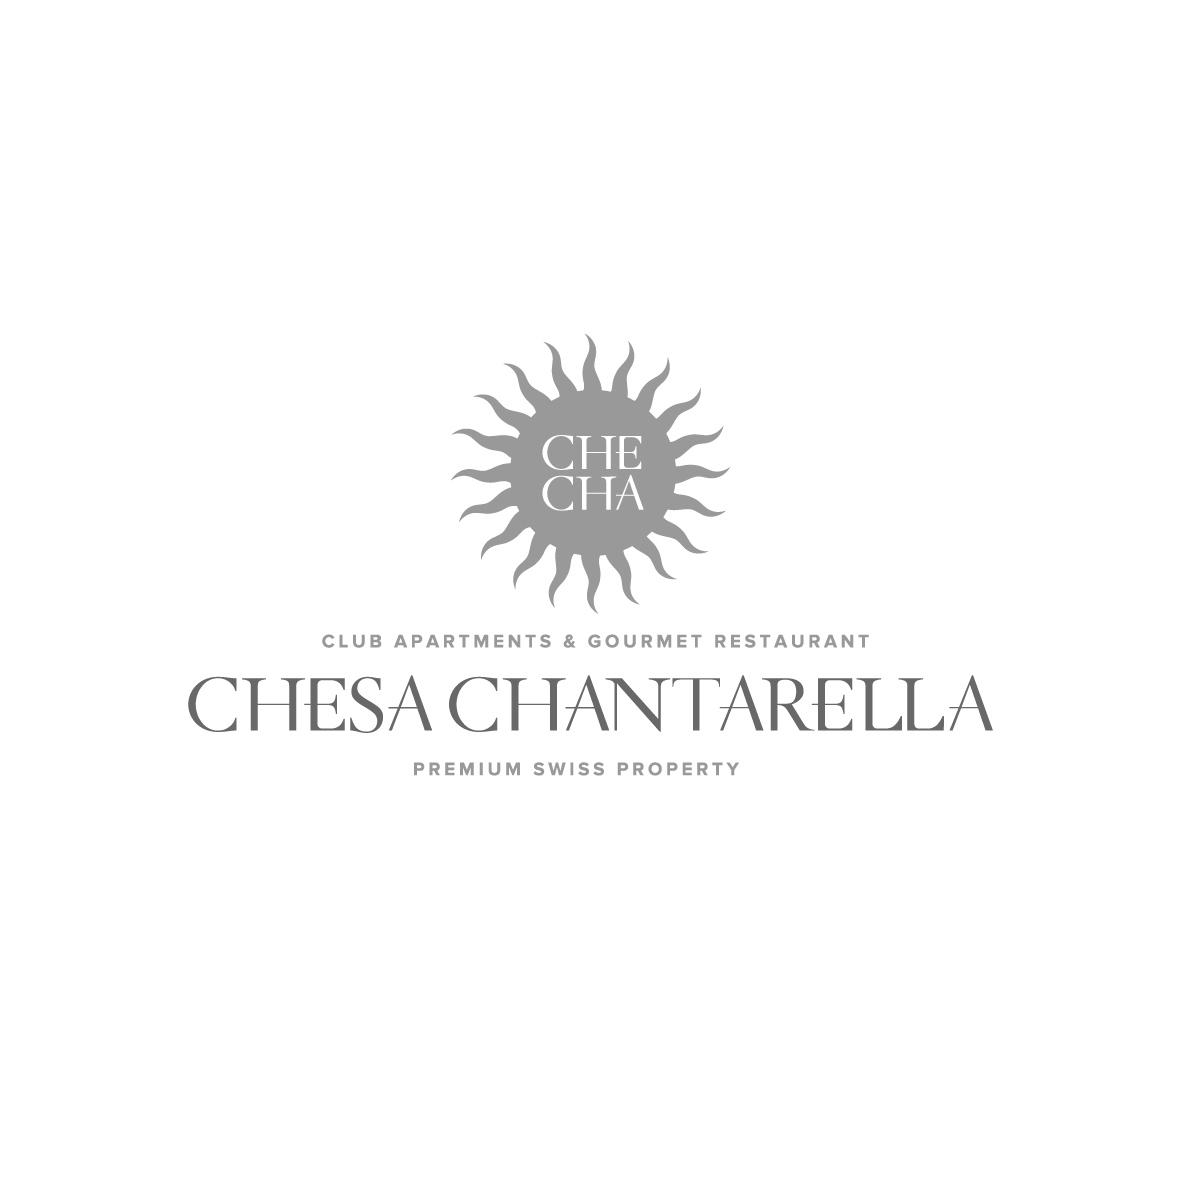 CHE CHA CLUB APARTMENTS & GOURMET RESTAURANT CHESA CHANTARELLA PREMIUM SWISS PROPERTY